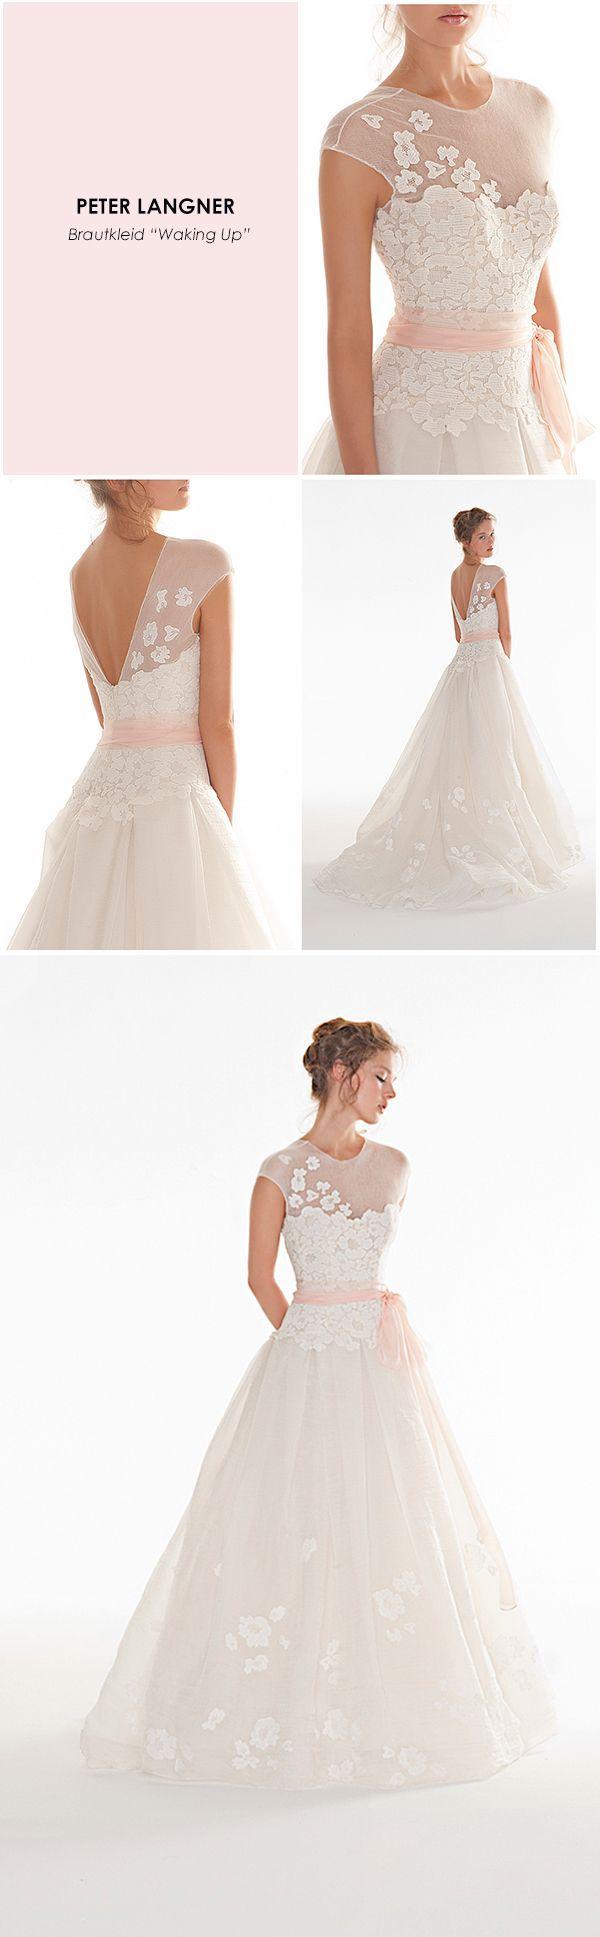 an amazing dress...